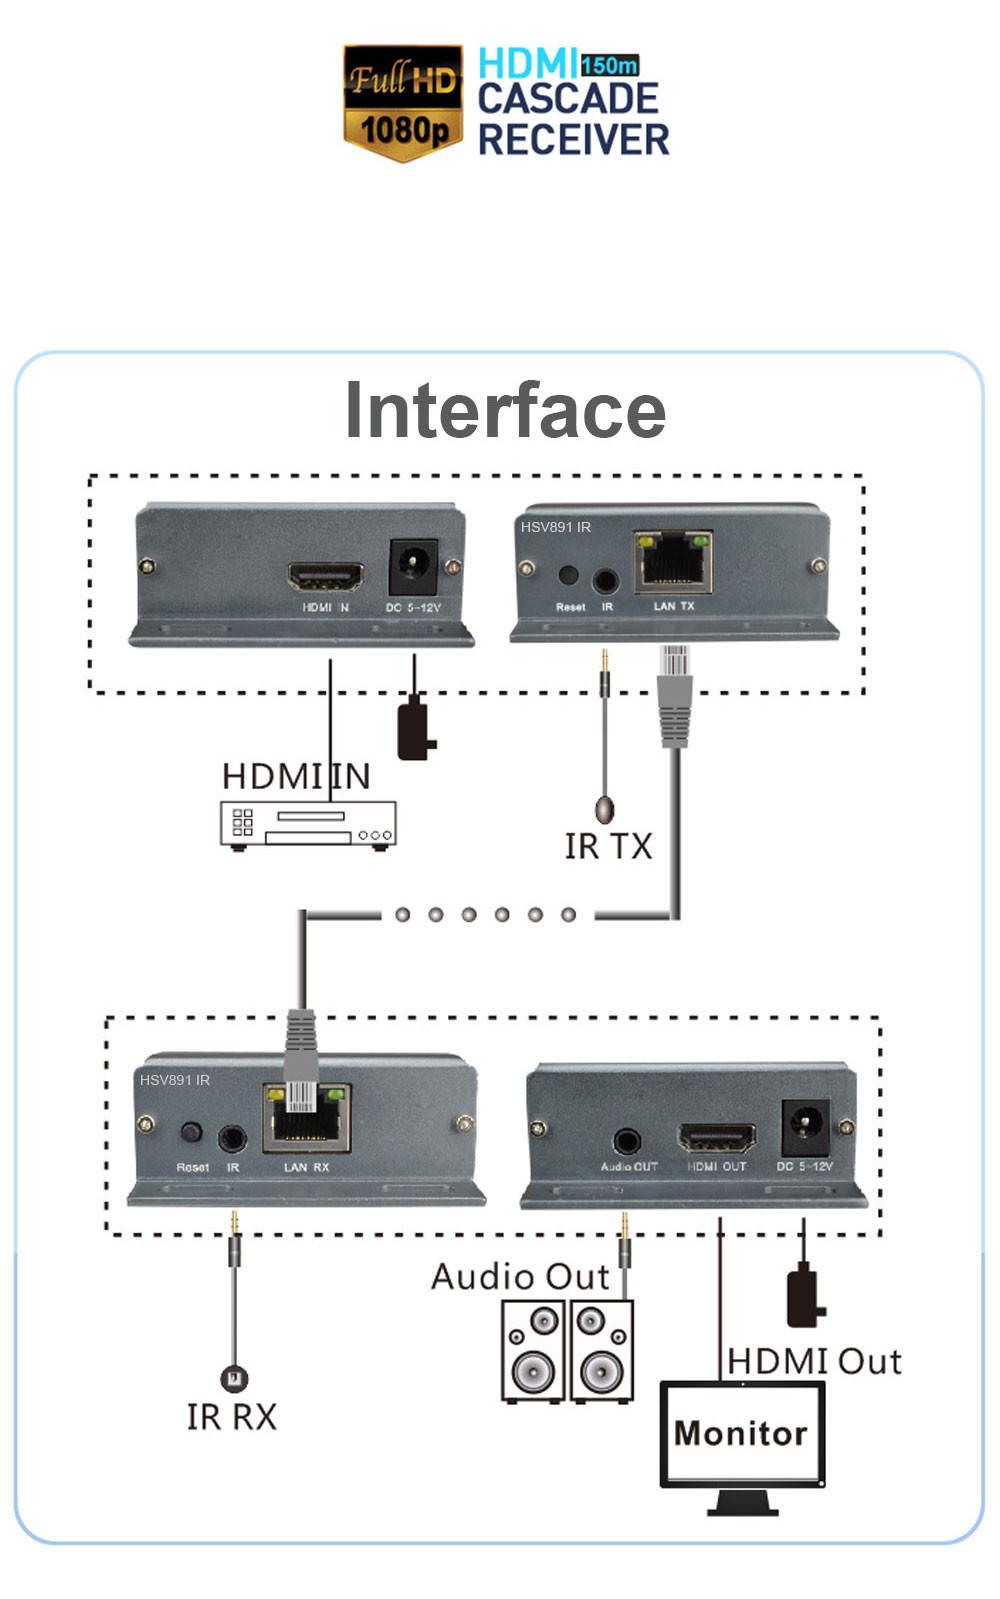 HDMI-EXTENDER-HSV891IR_09